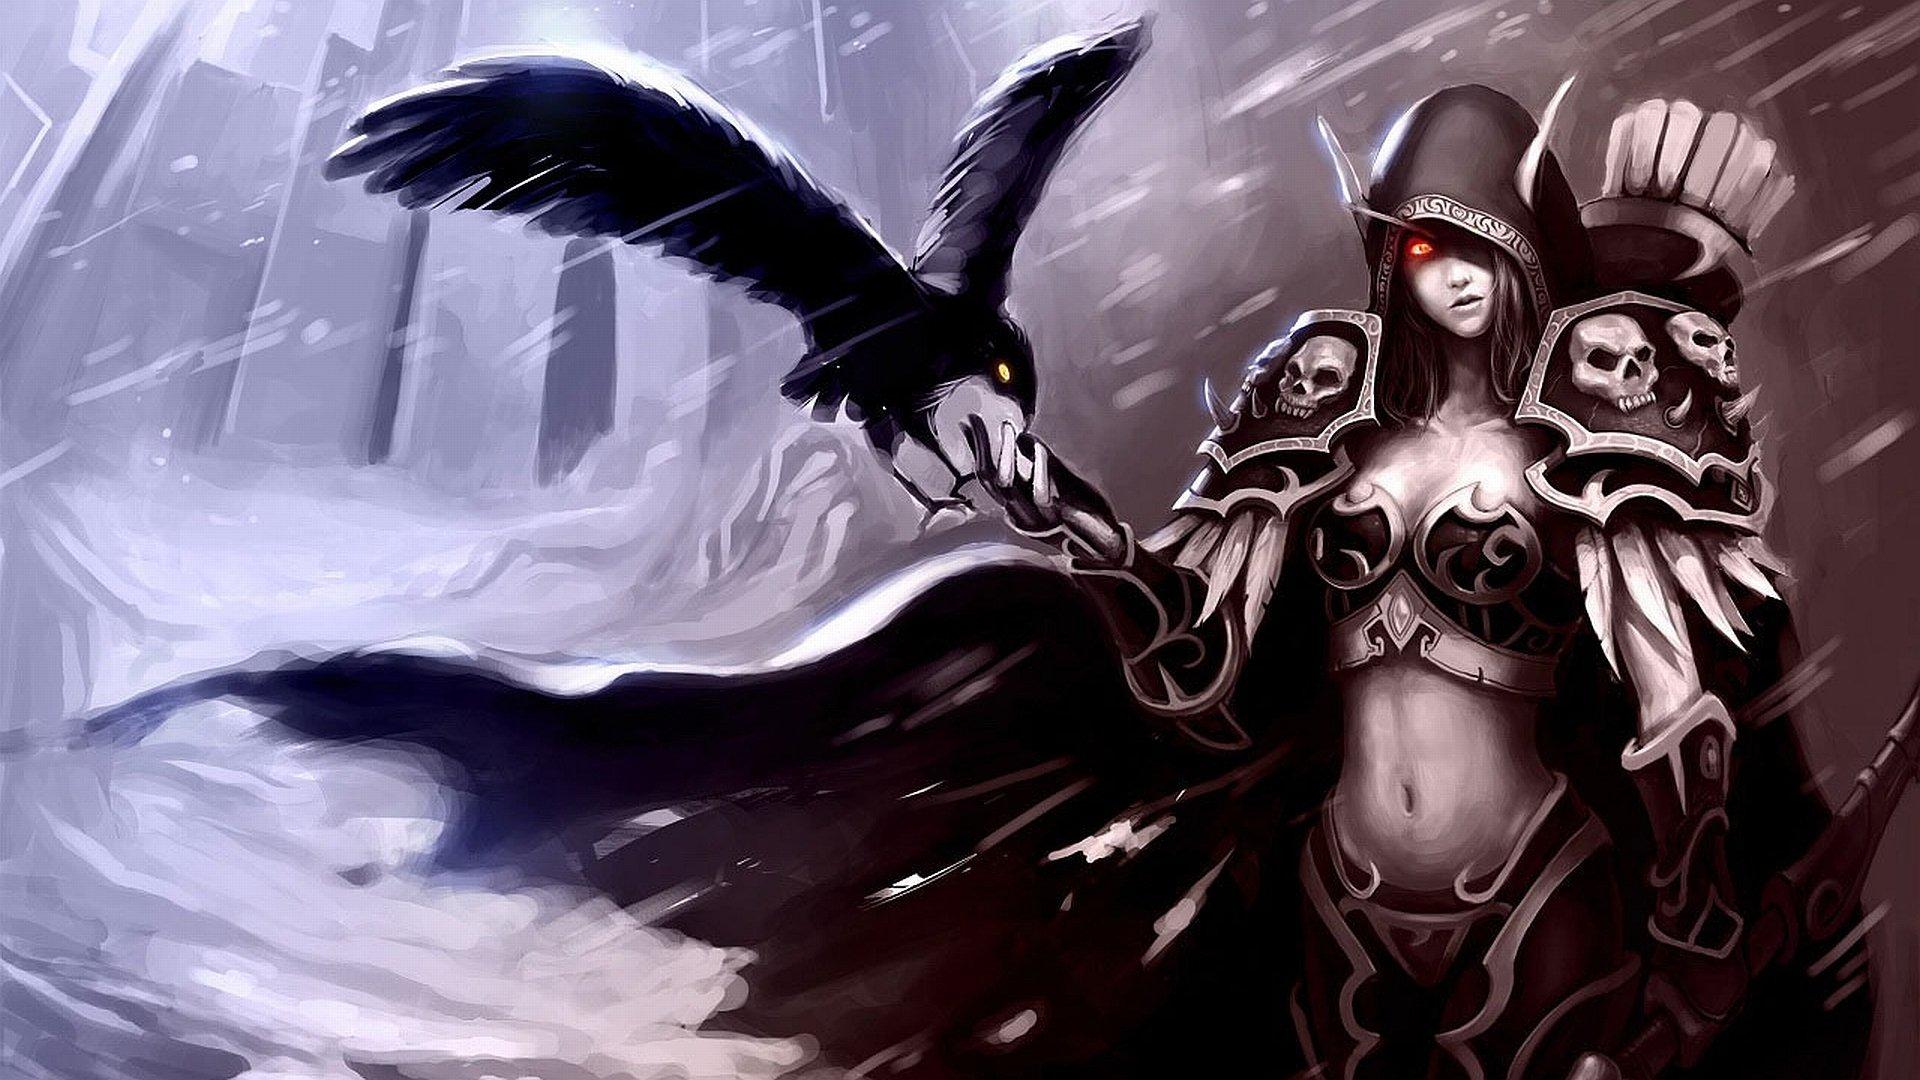 The dark elf hd wallpaper background image 1920x1080 id 170867 wallpaper abyss - Sylvanas windrunner wallpaper ...